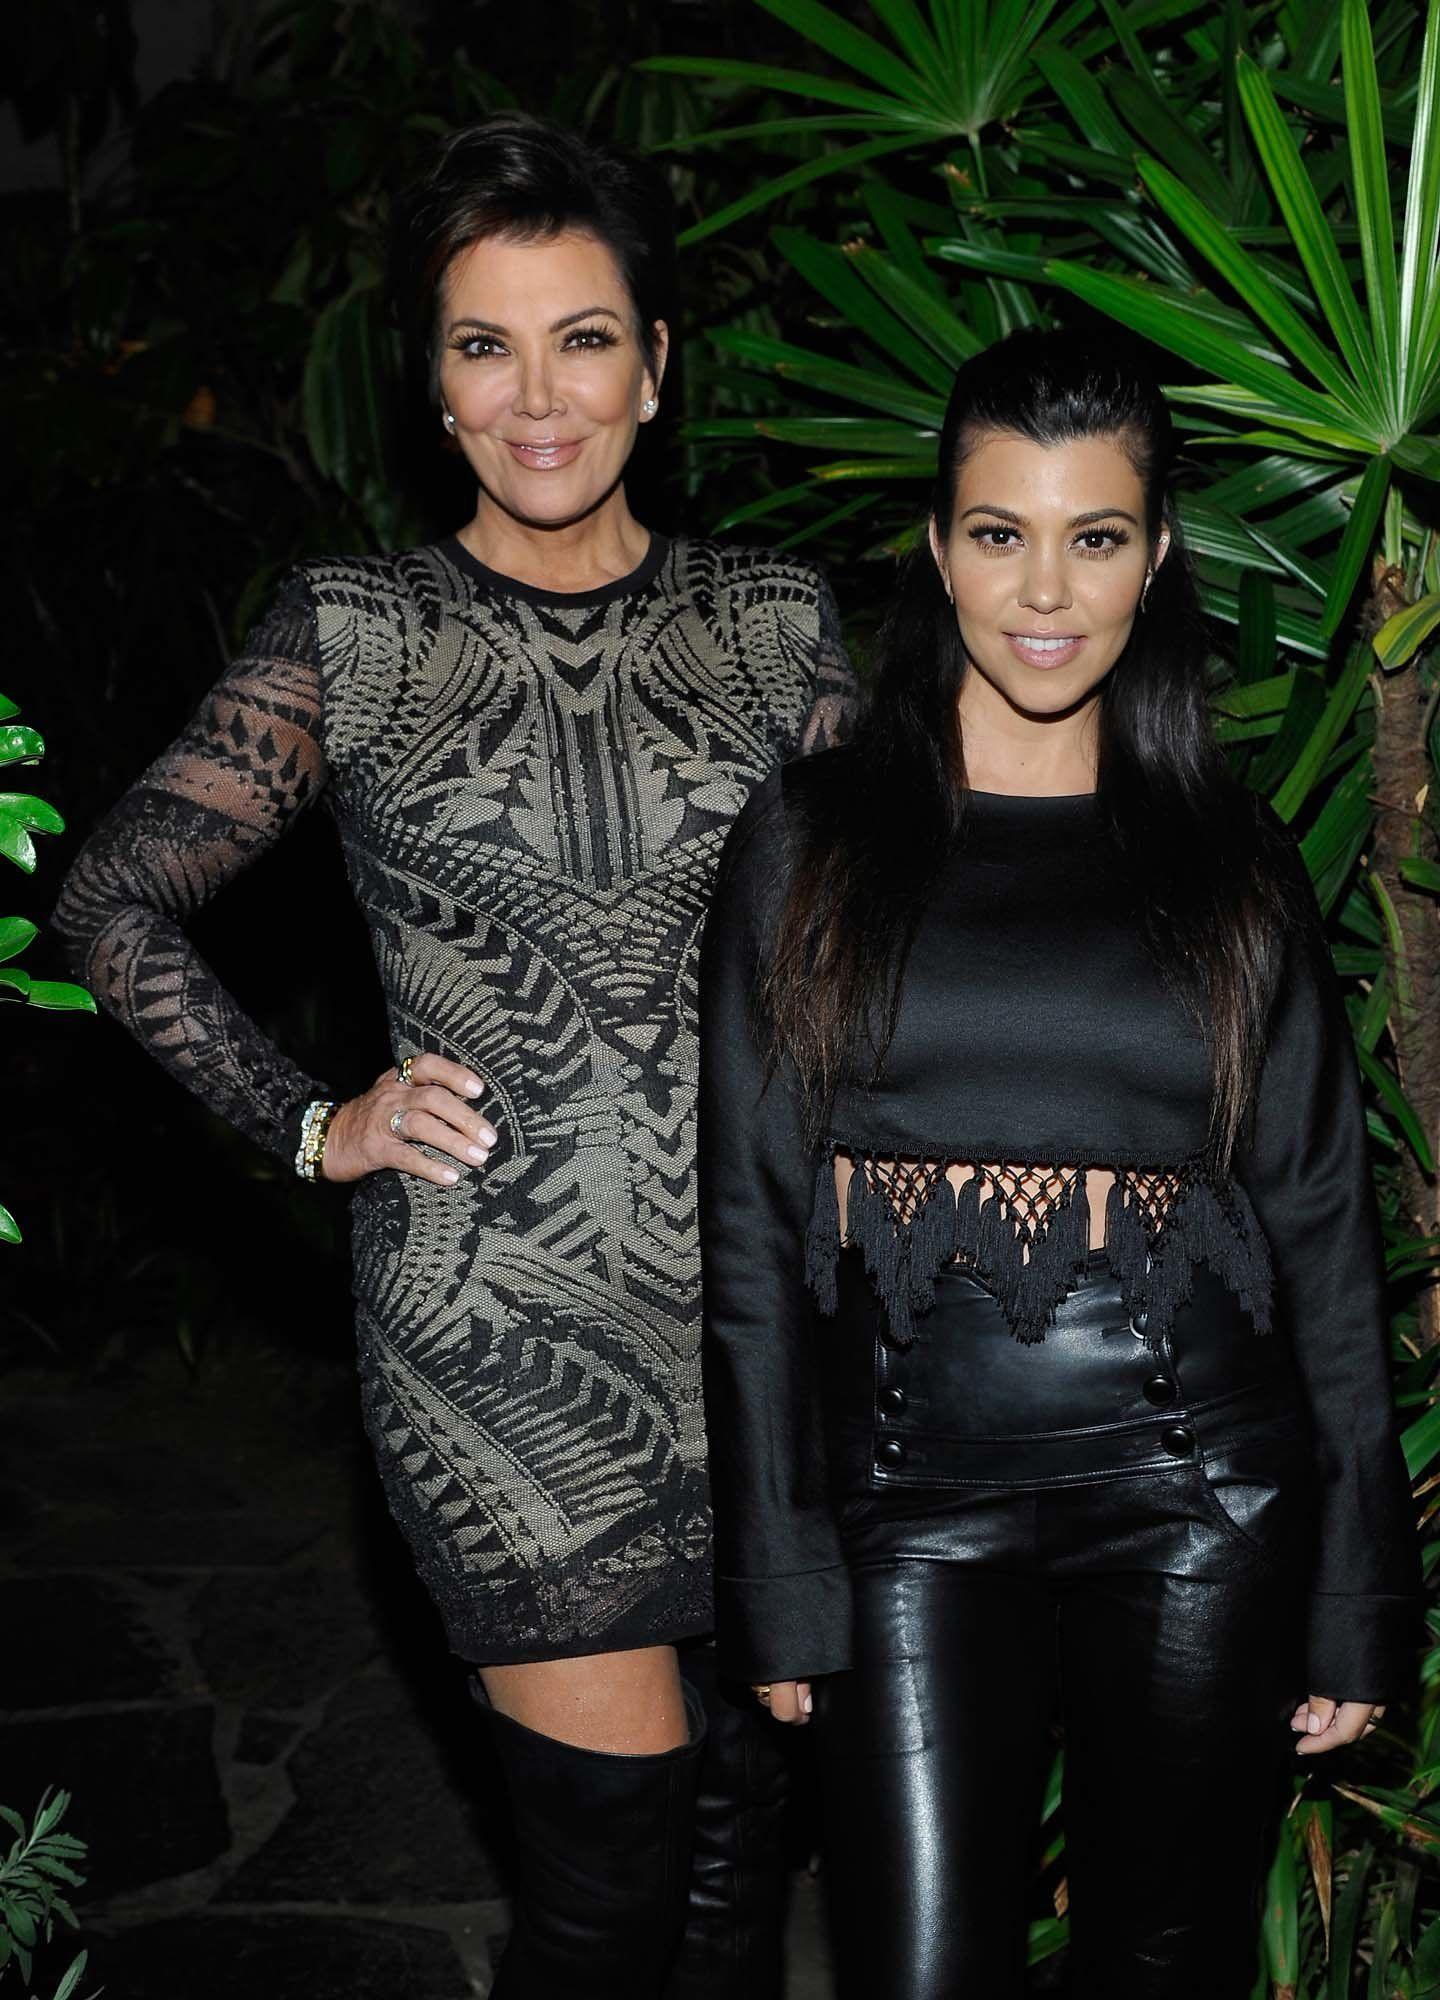 Kris Jenner and Kourtney Kardashian  kardashians  Pinterest  Kris